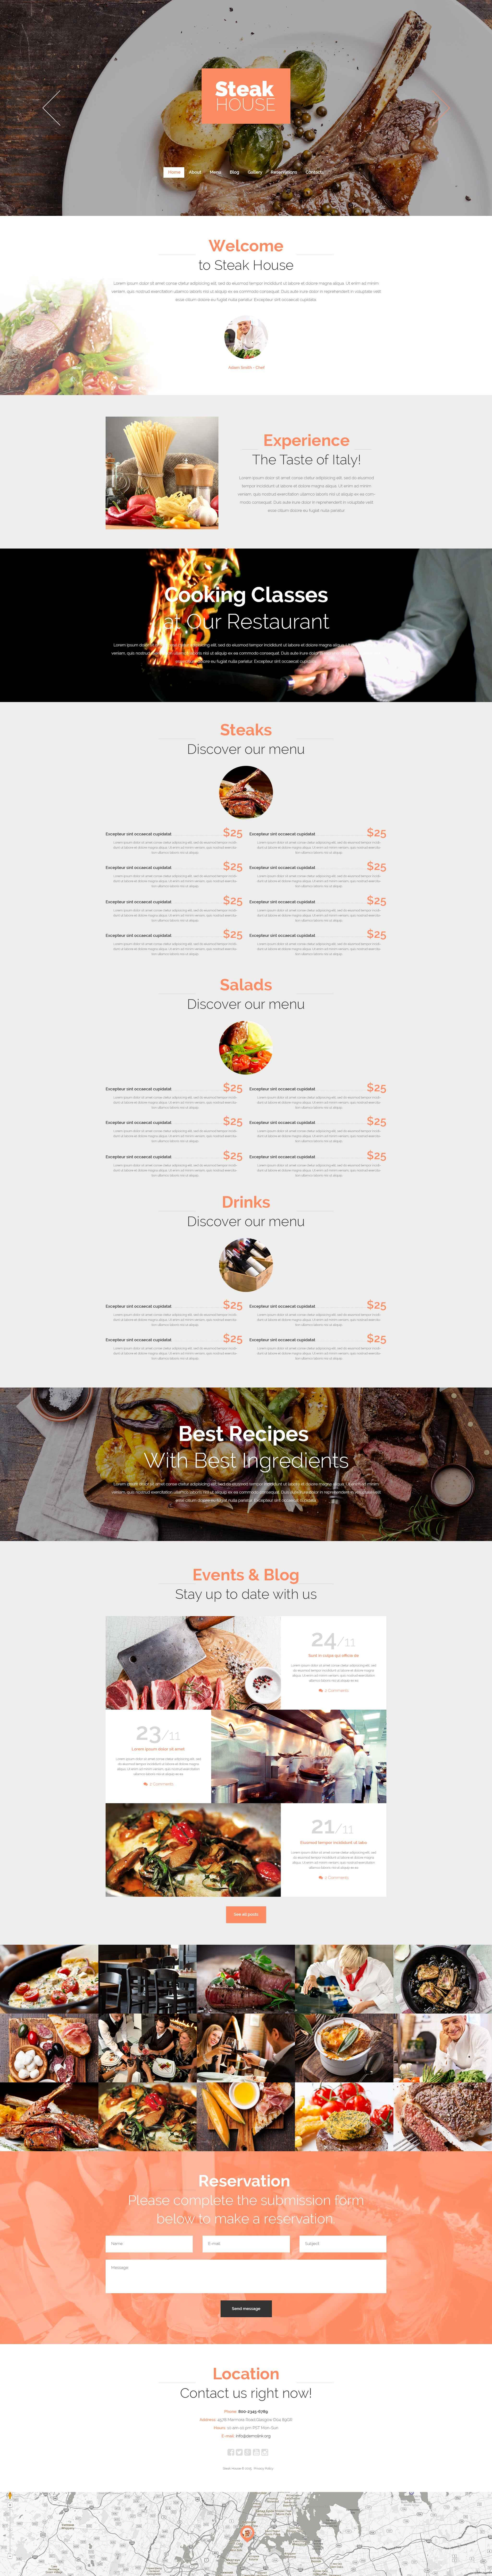 """Cafe and Restaurant"" - адаптивний Drupal шаблон №52671"